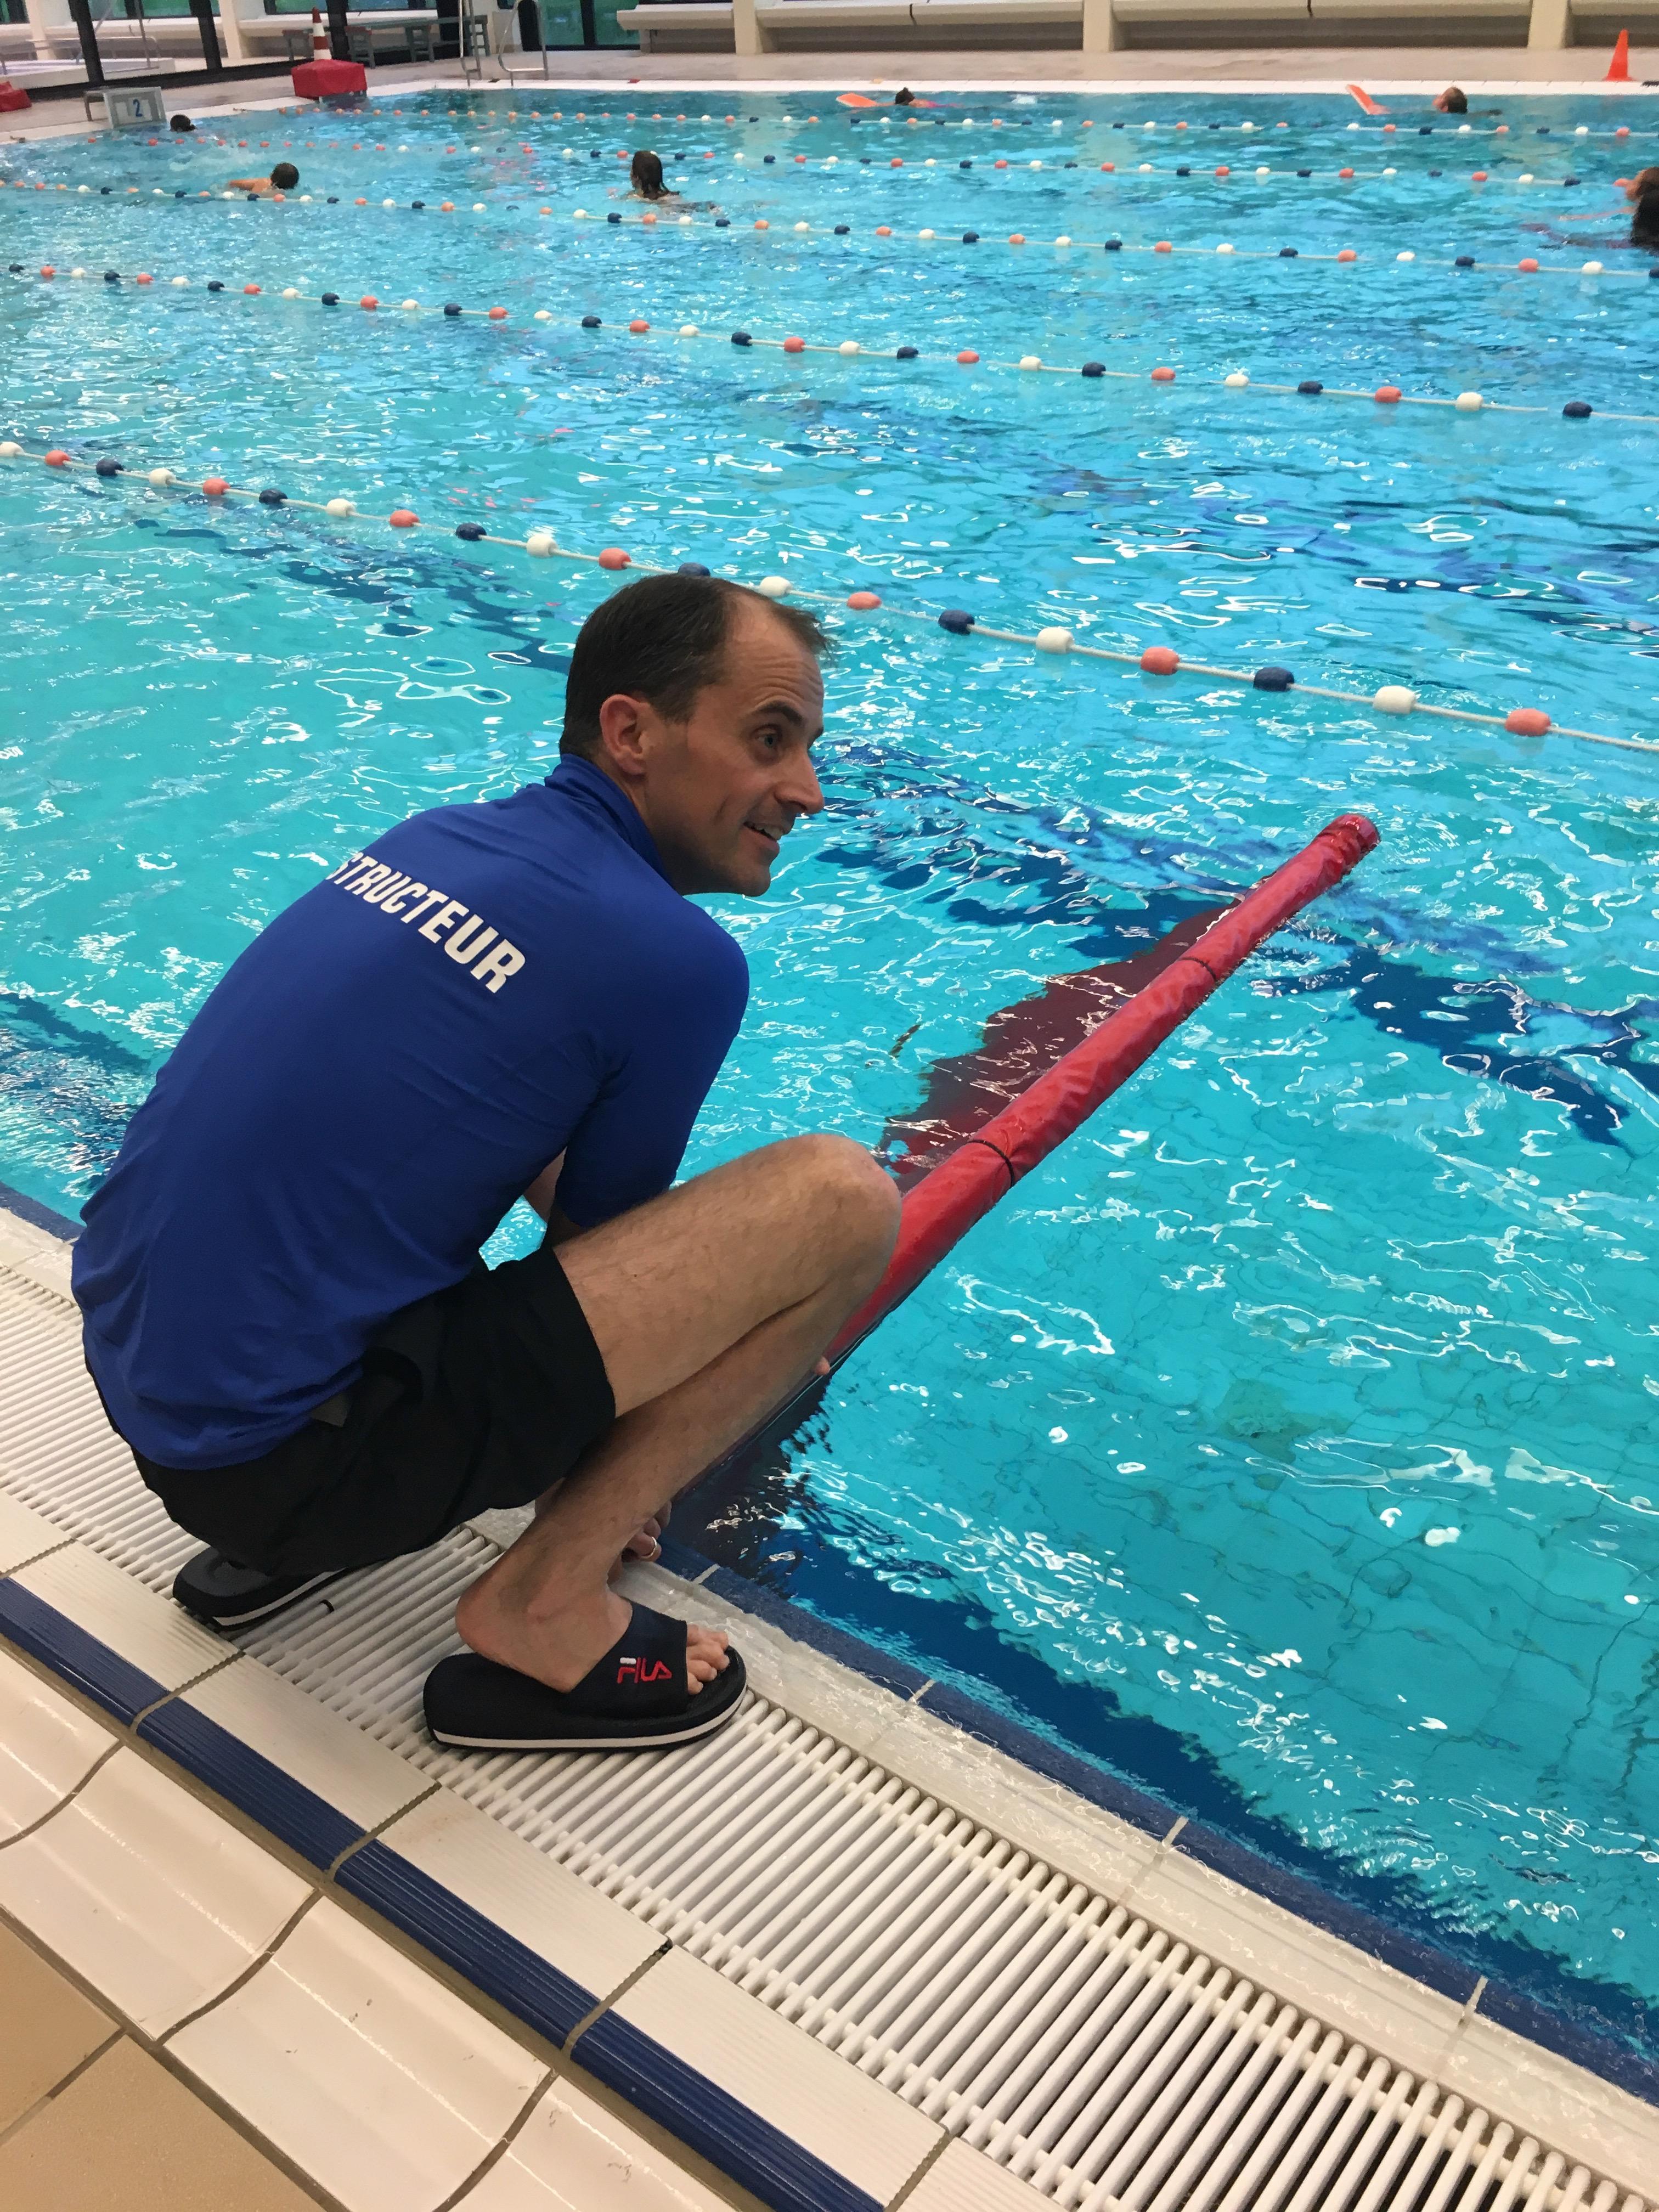 Tonnes Blonk Ouder kind zwemmen WRB